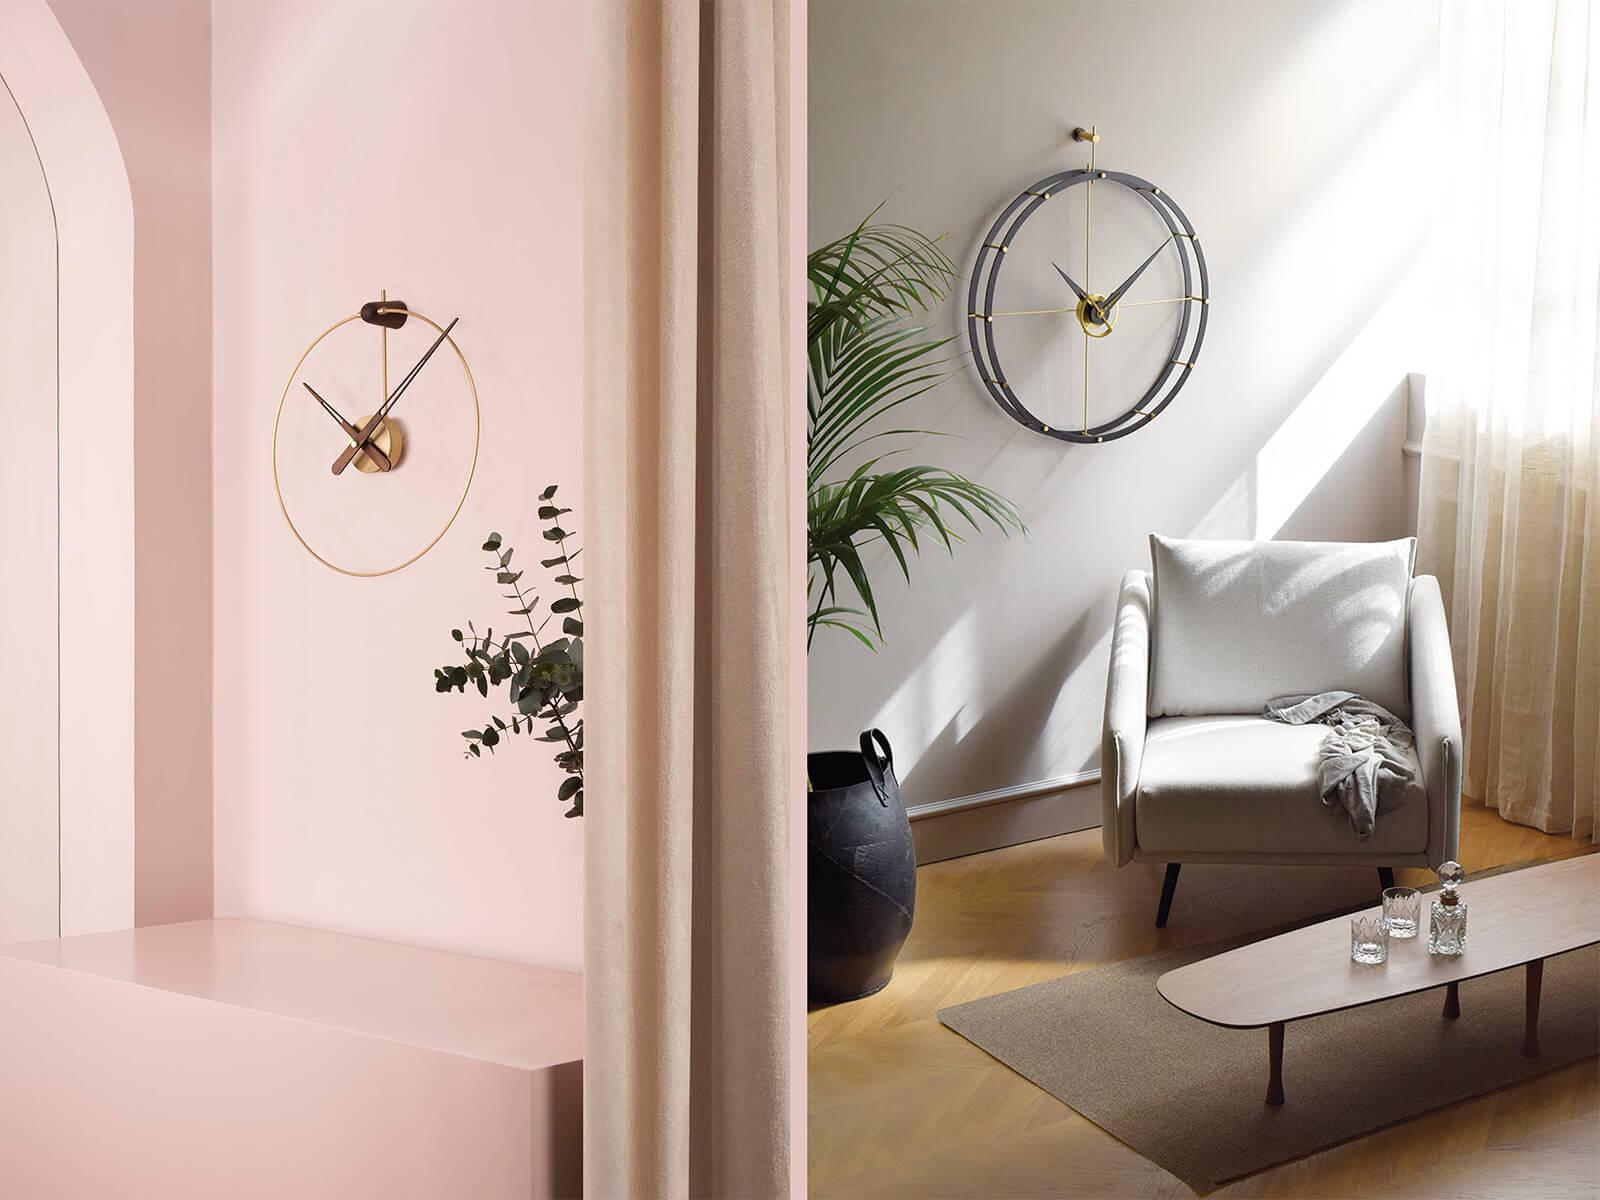 nomon 西班牙進口品牌 手工時鐘掛鐘MCANG MICRO ANDA-clocks